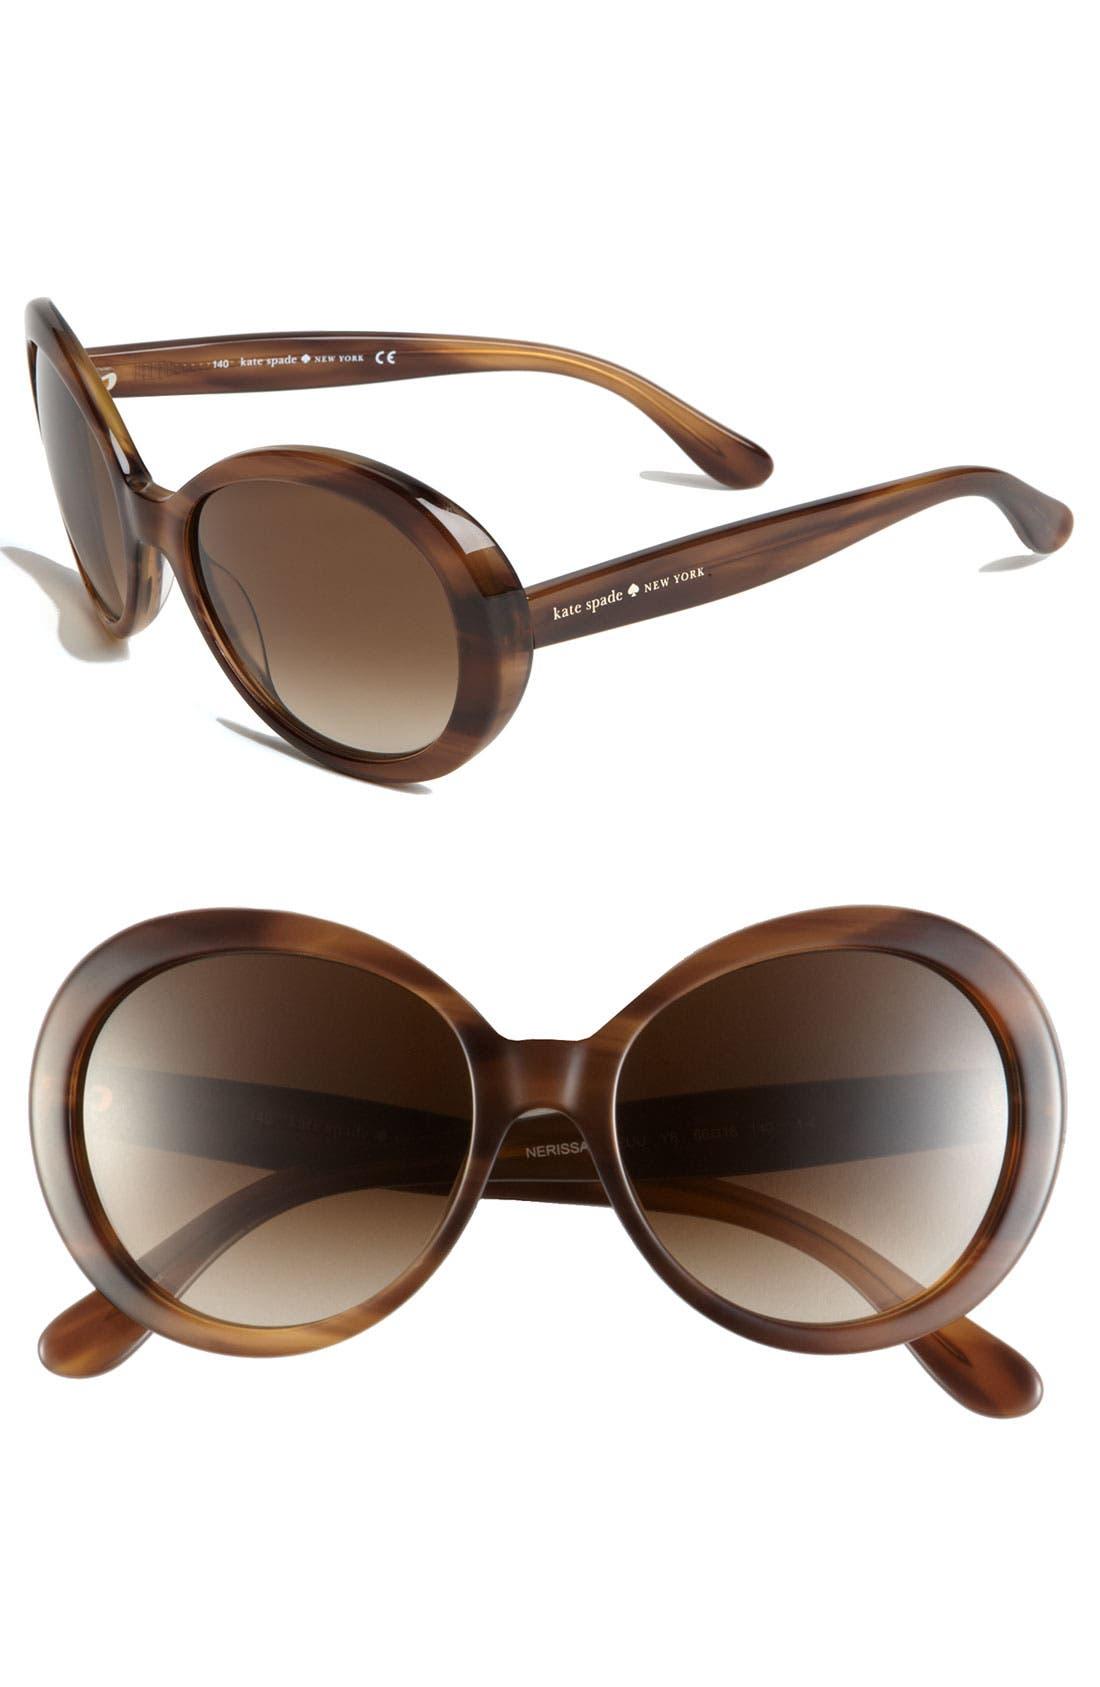 Main Image - kate spade new york retro sunglasses